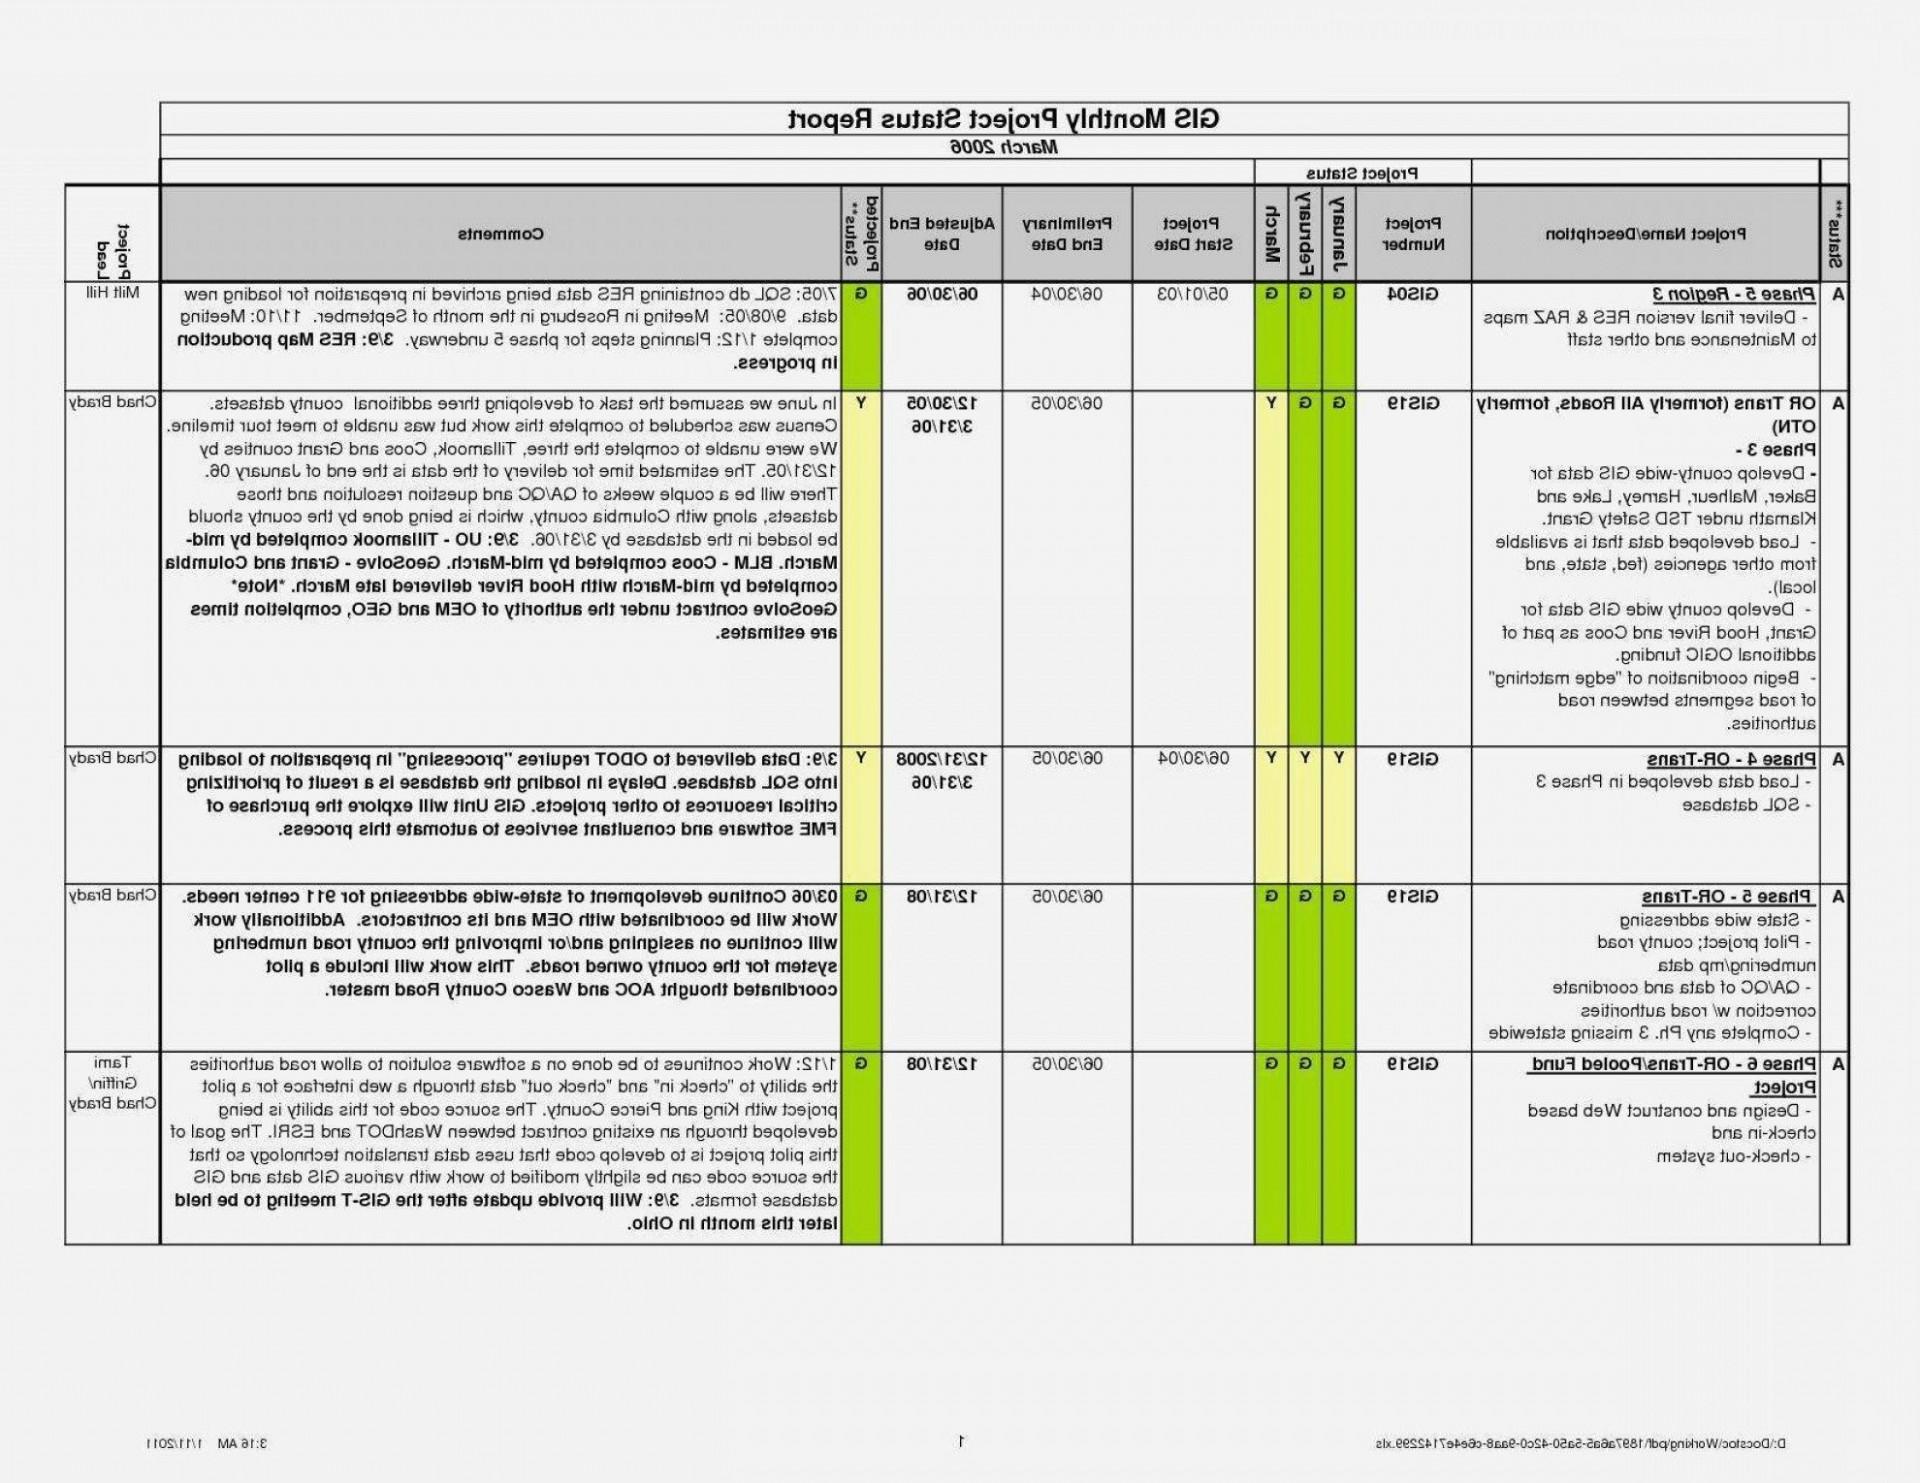 000 Impressive Project Management Statu Report Template Excel High Definition  Gantt 2016 Progres1920